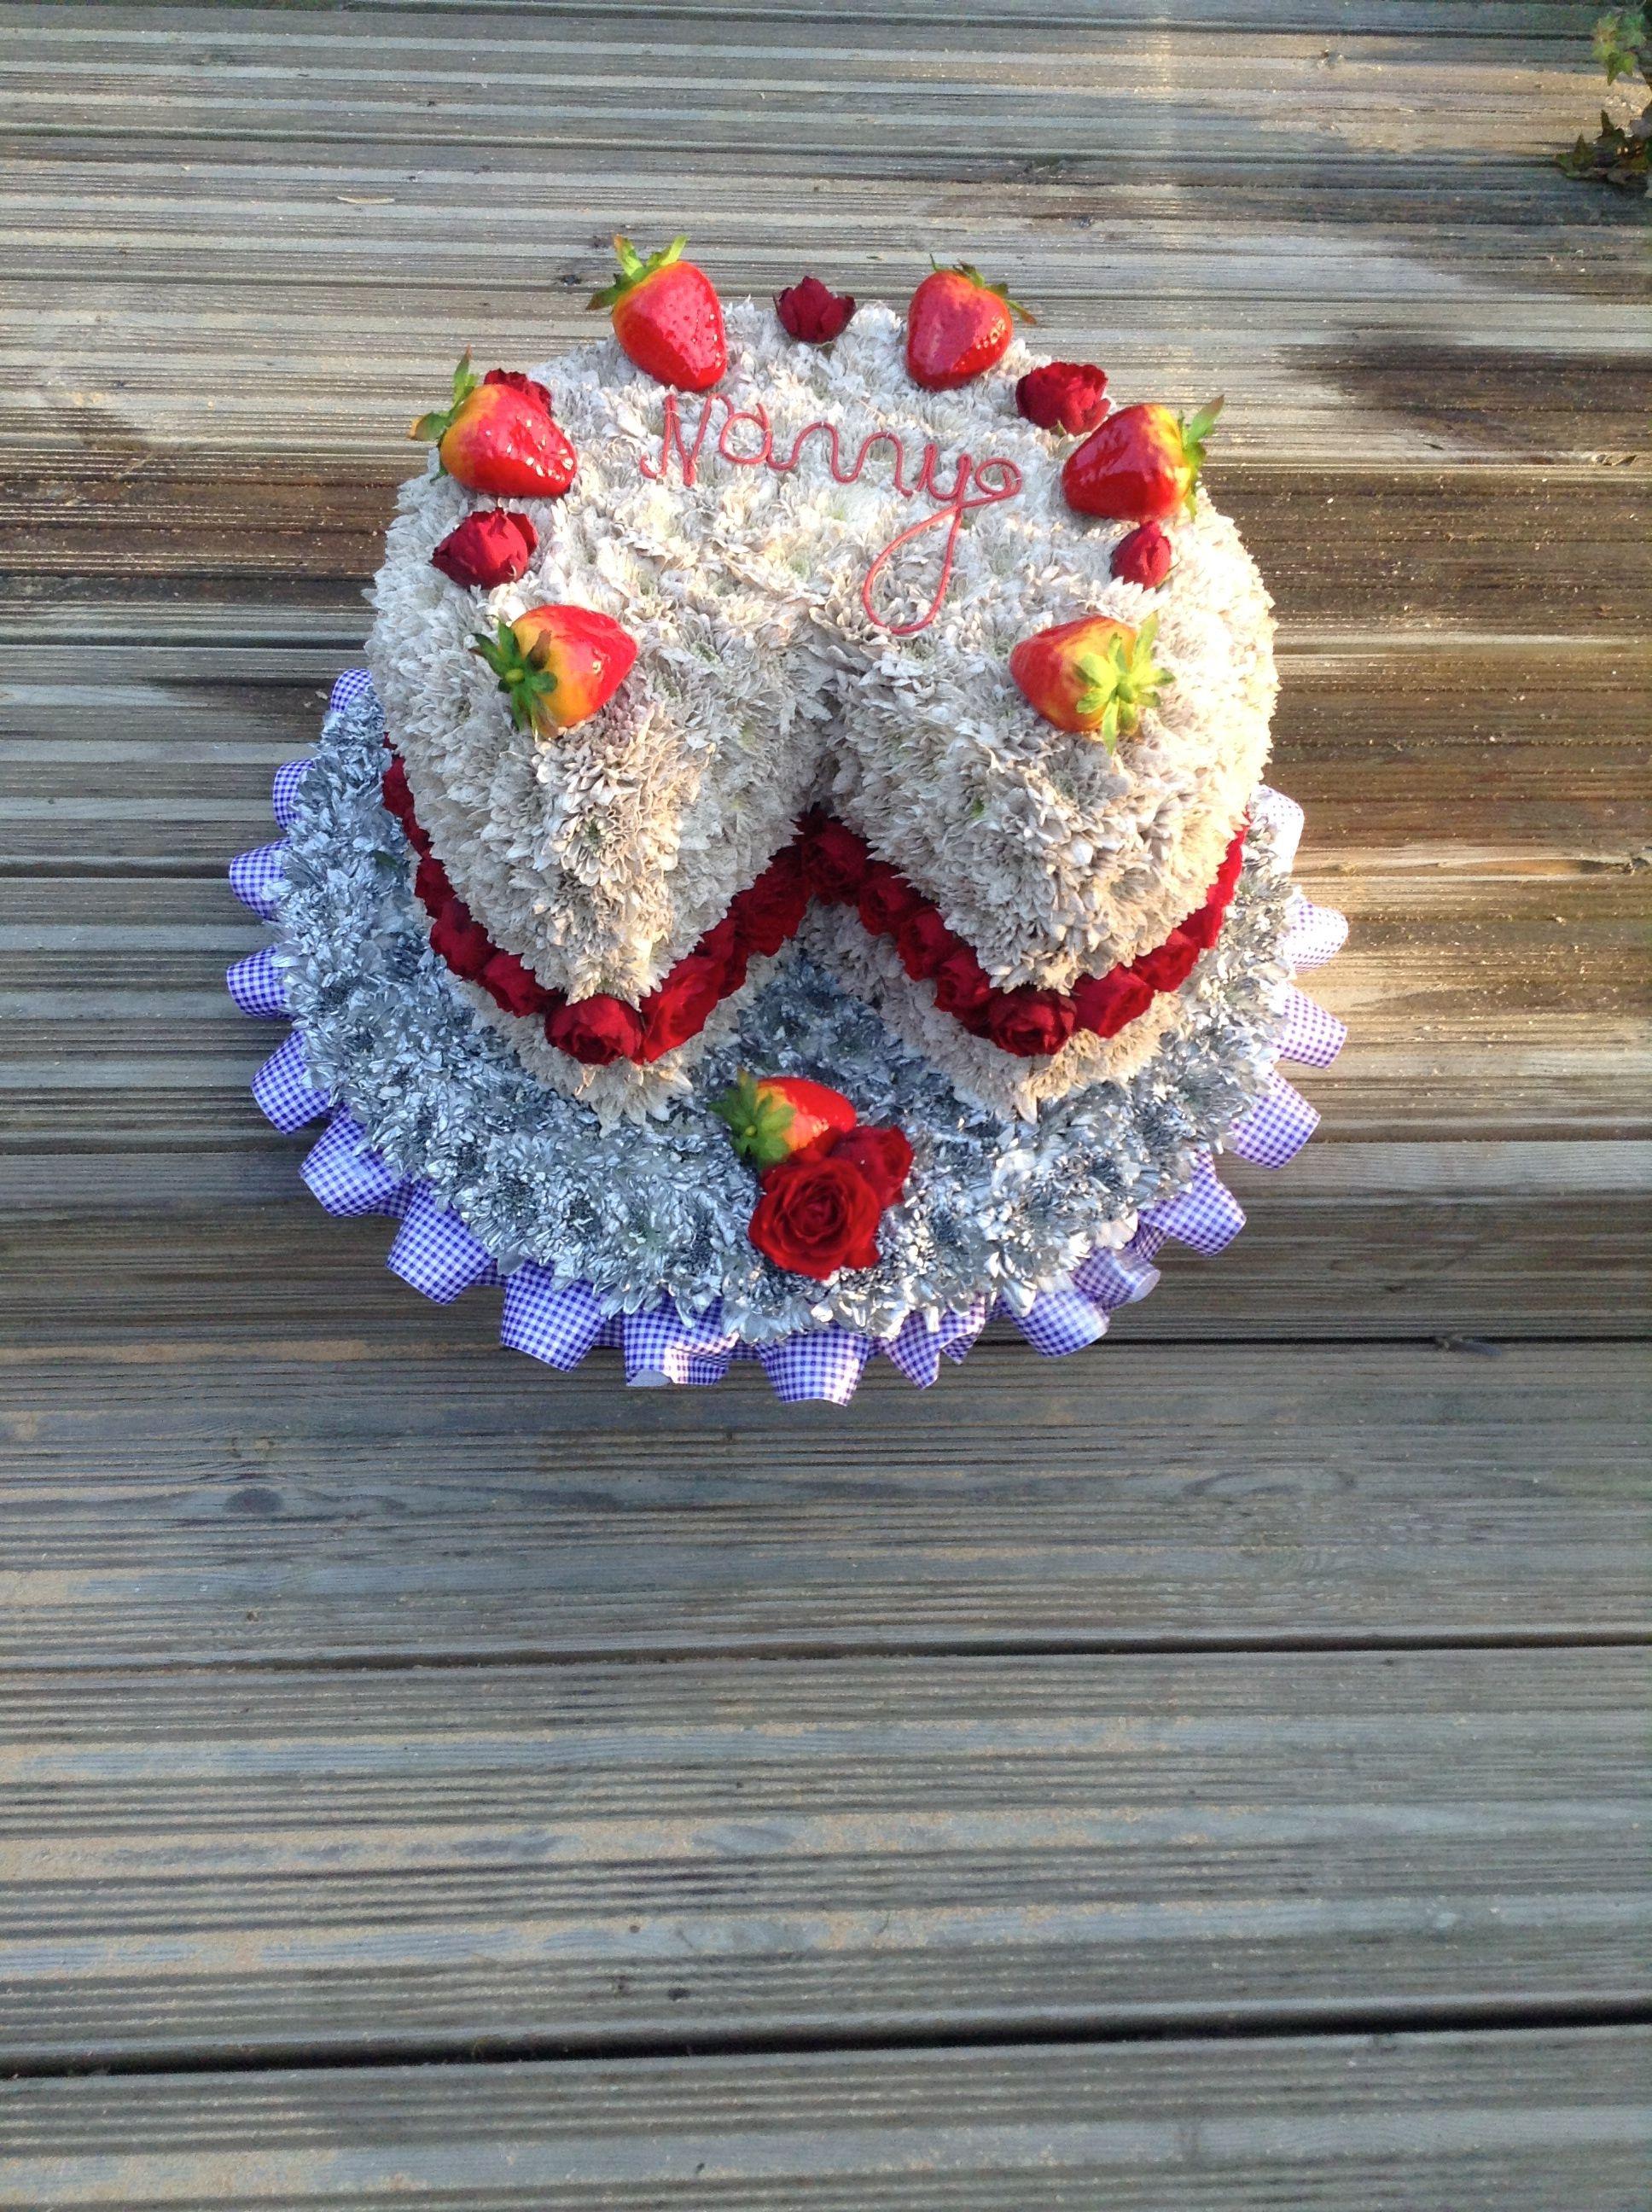 Cake Funeral Flower Tribute Victoria Sponge Made In Flowers